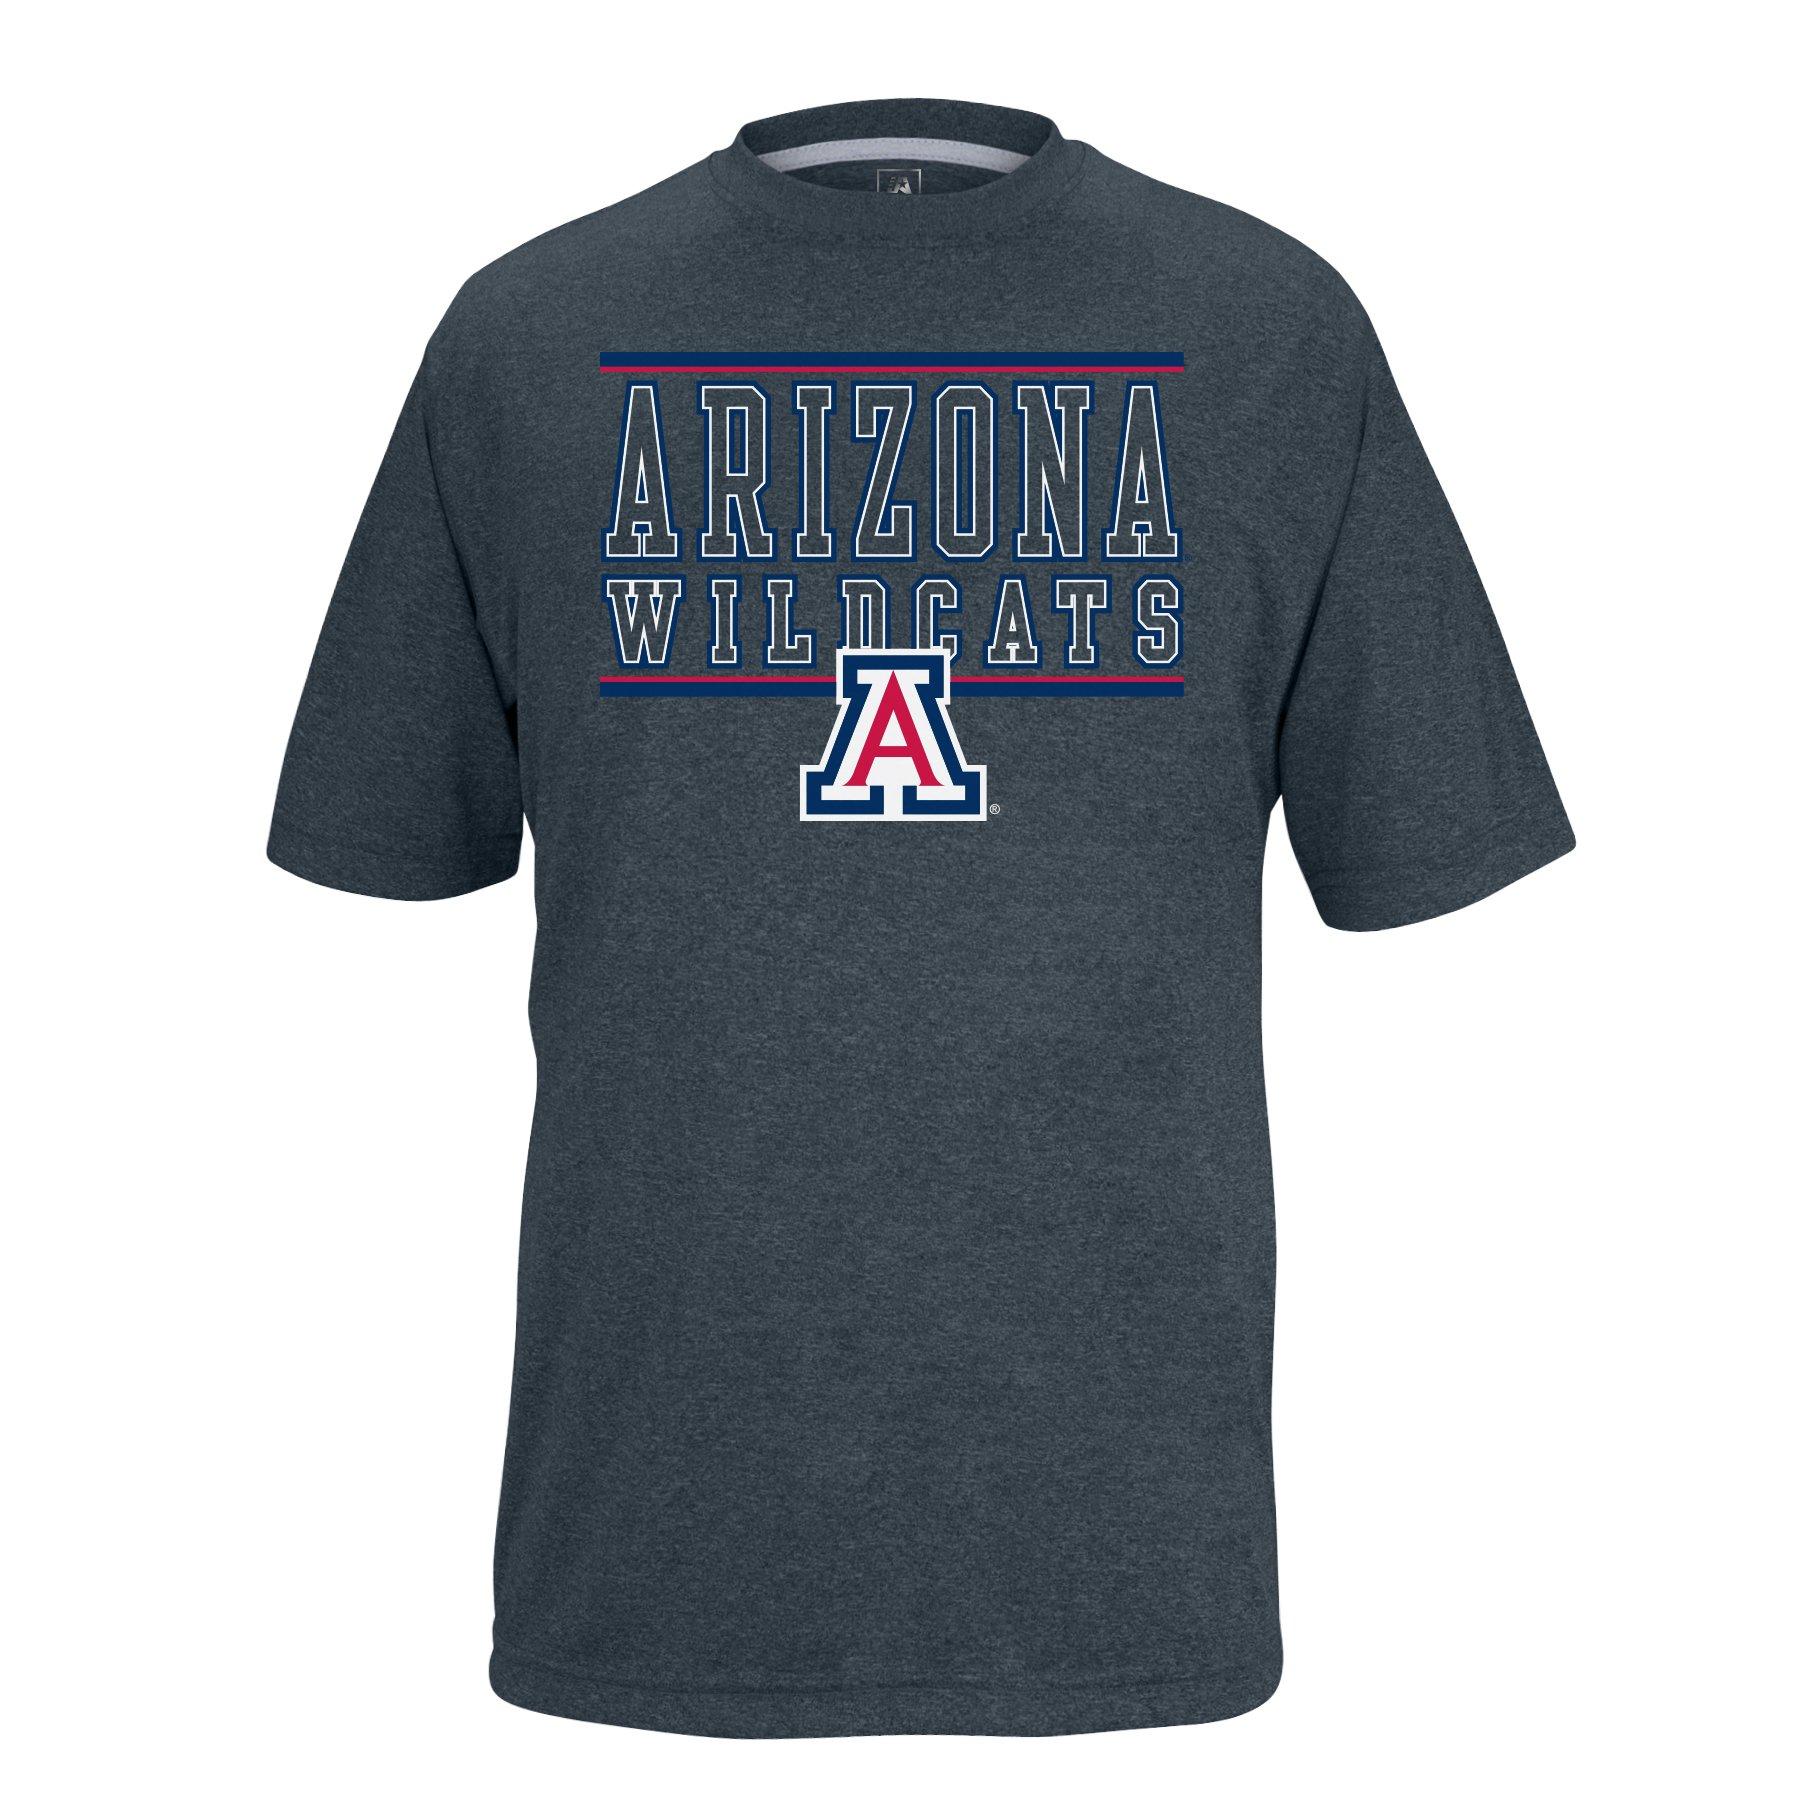 NCAA Arizona Wildcats Boys Youth Bar Design Vital Poly Tee, Charcoal Heather, Small